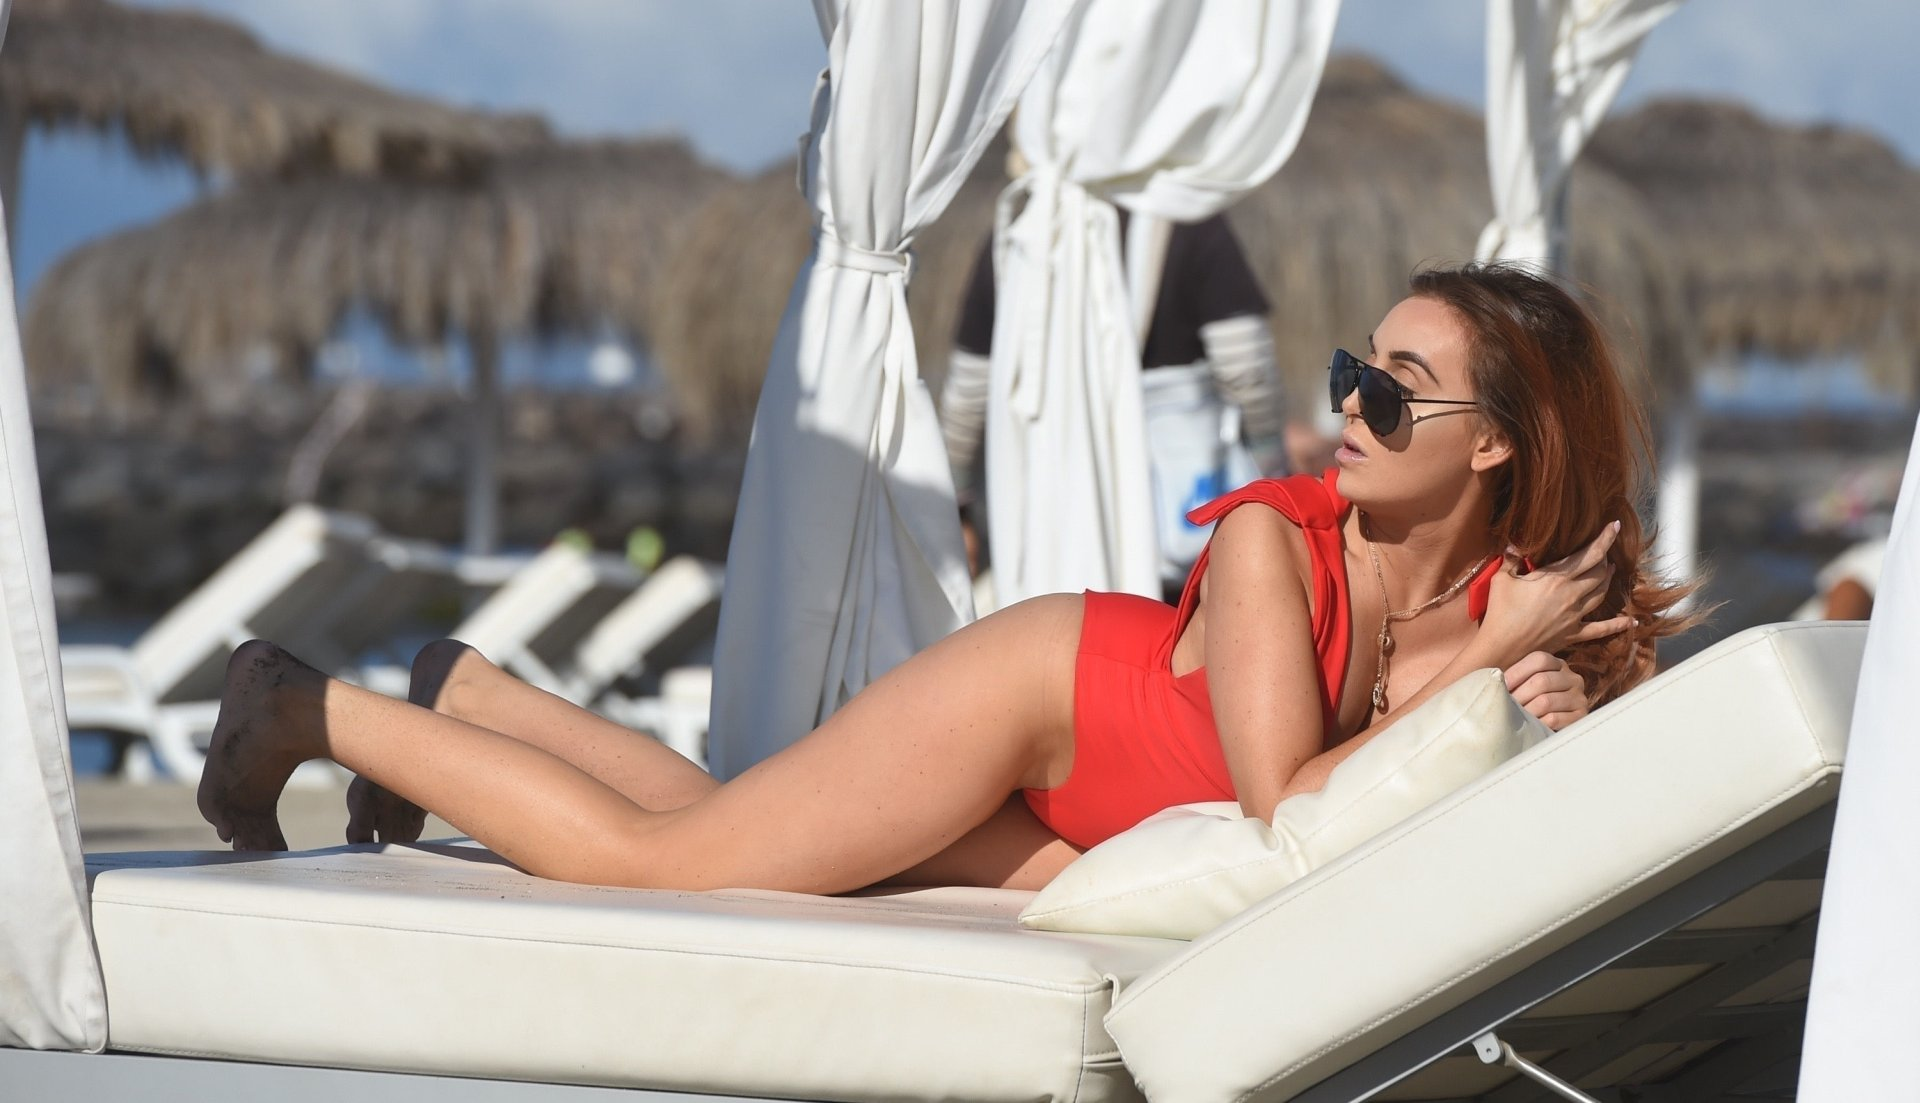 Tits Pussy Laura Simpson  nudes (29 fotos), Snapchat, bra